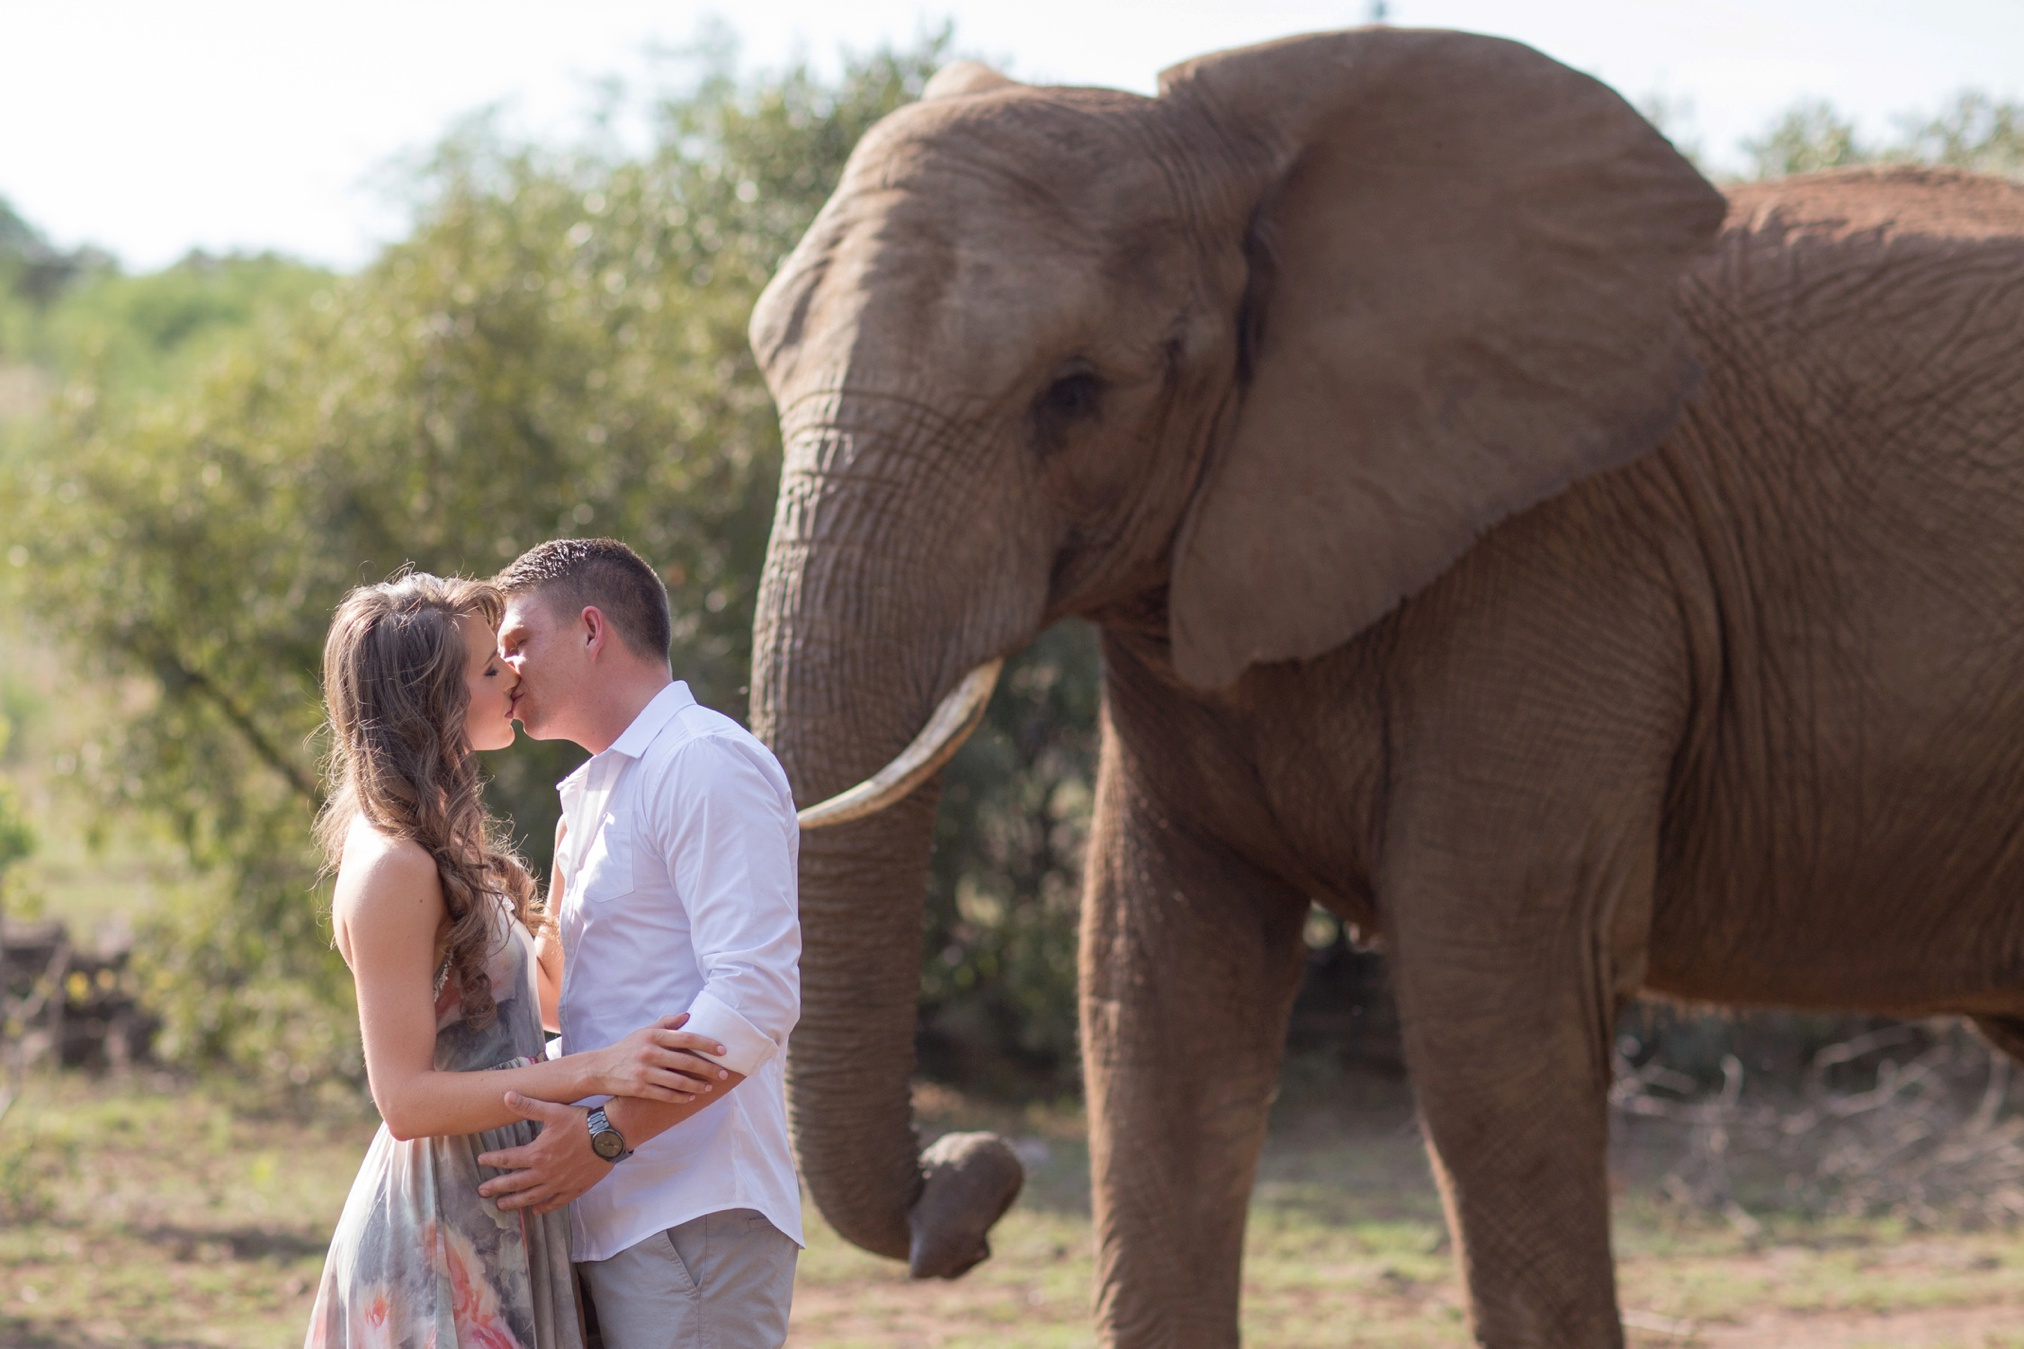 Glen_Afric_Kyle_and_Lindsay_engagement_elephants_safari_2